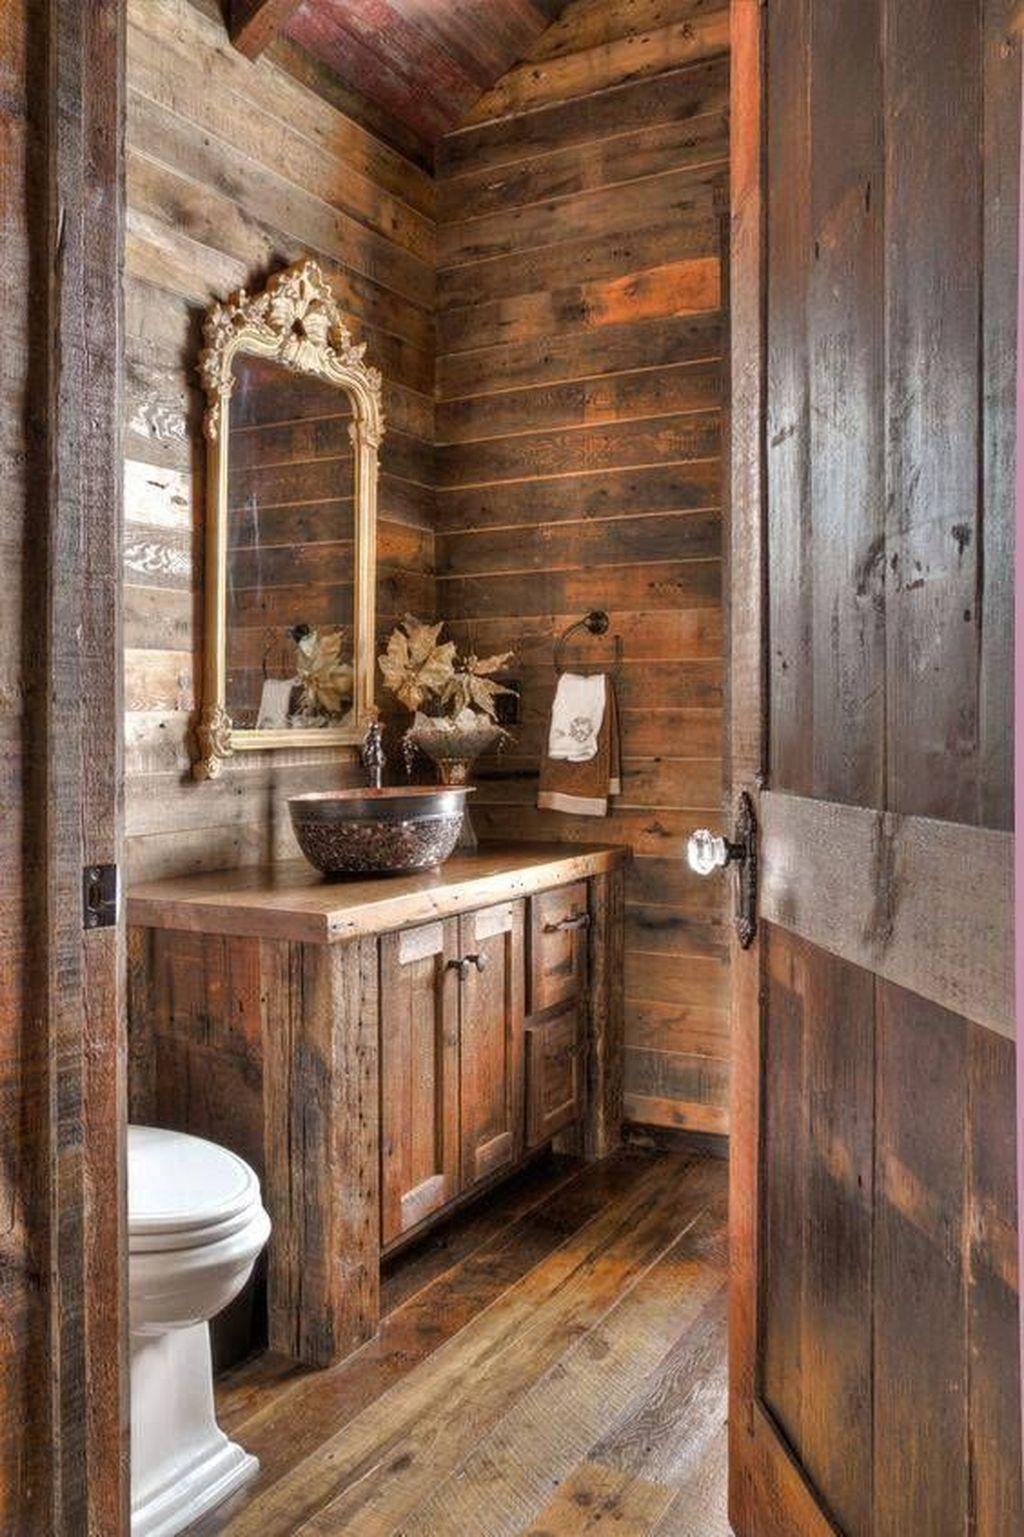 Fascinating Rustic Bathroom Decor Ideas You Must Copy 06